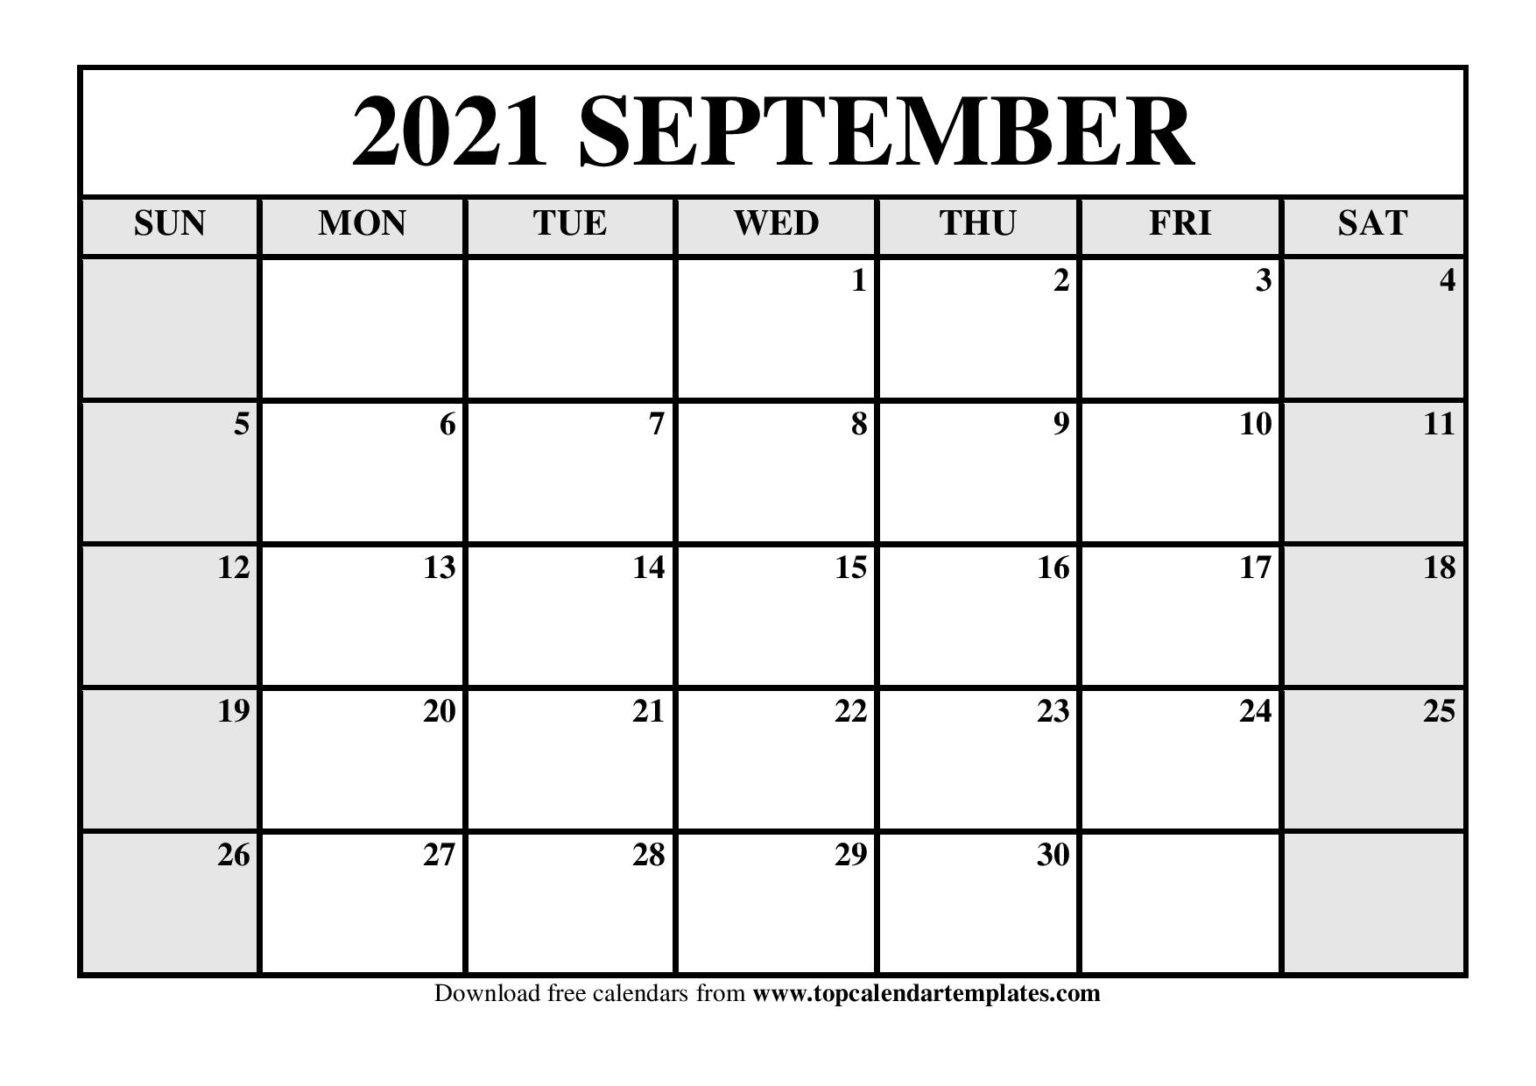 Free September 2021 Calendar Printable (Pdf, Word) Templates September 2021 Calendar Pdf